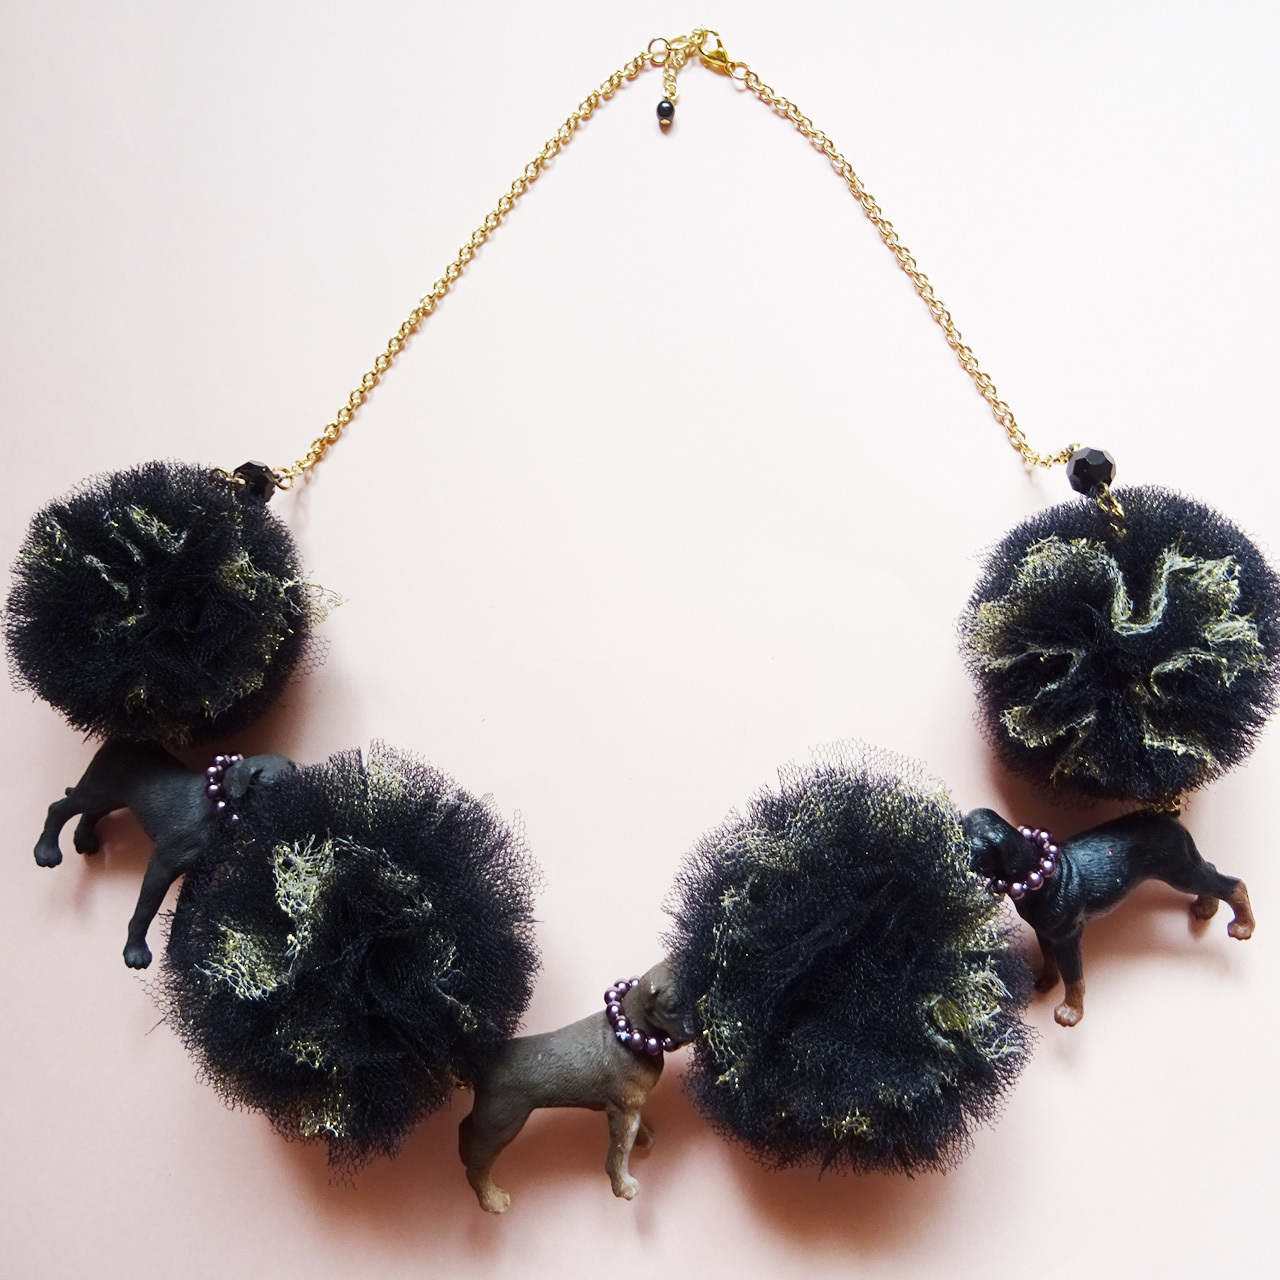 Sedmikrasky セドミックラスキー ポンポンチュール犬ネックレス / ブラック